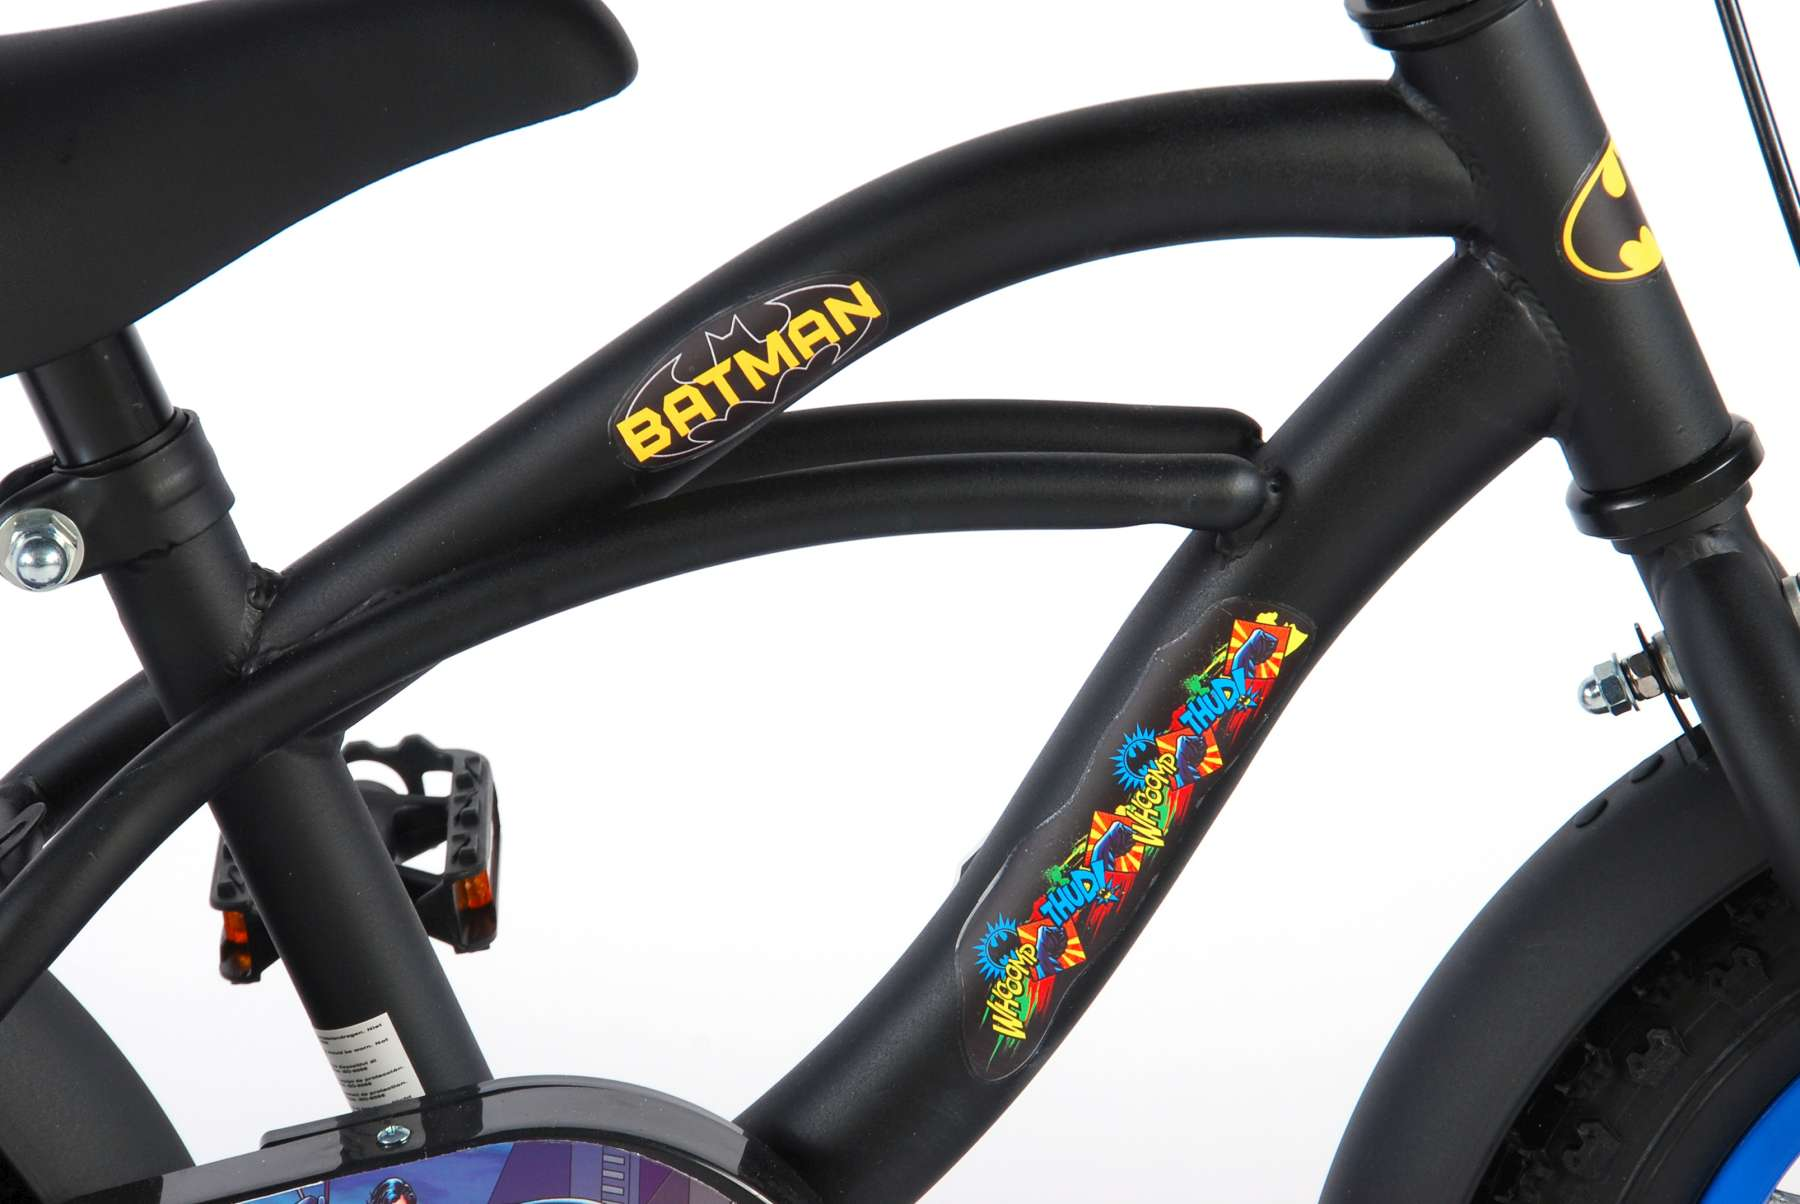 Batman 12 inch boys bicycle 95 assembled